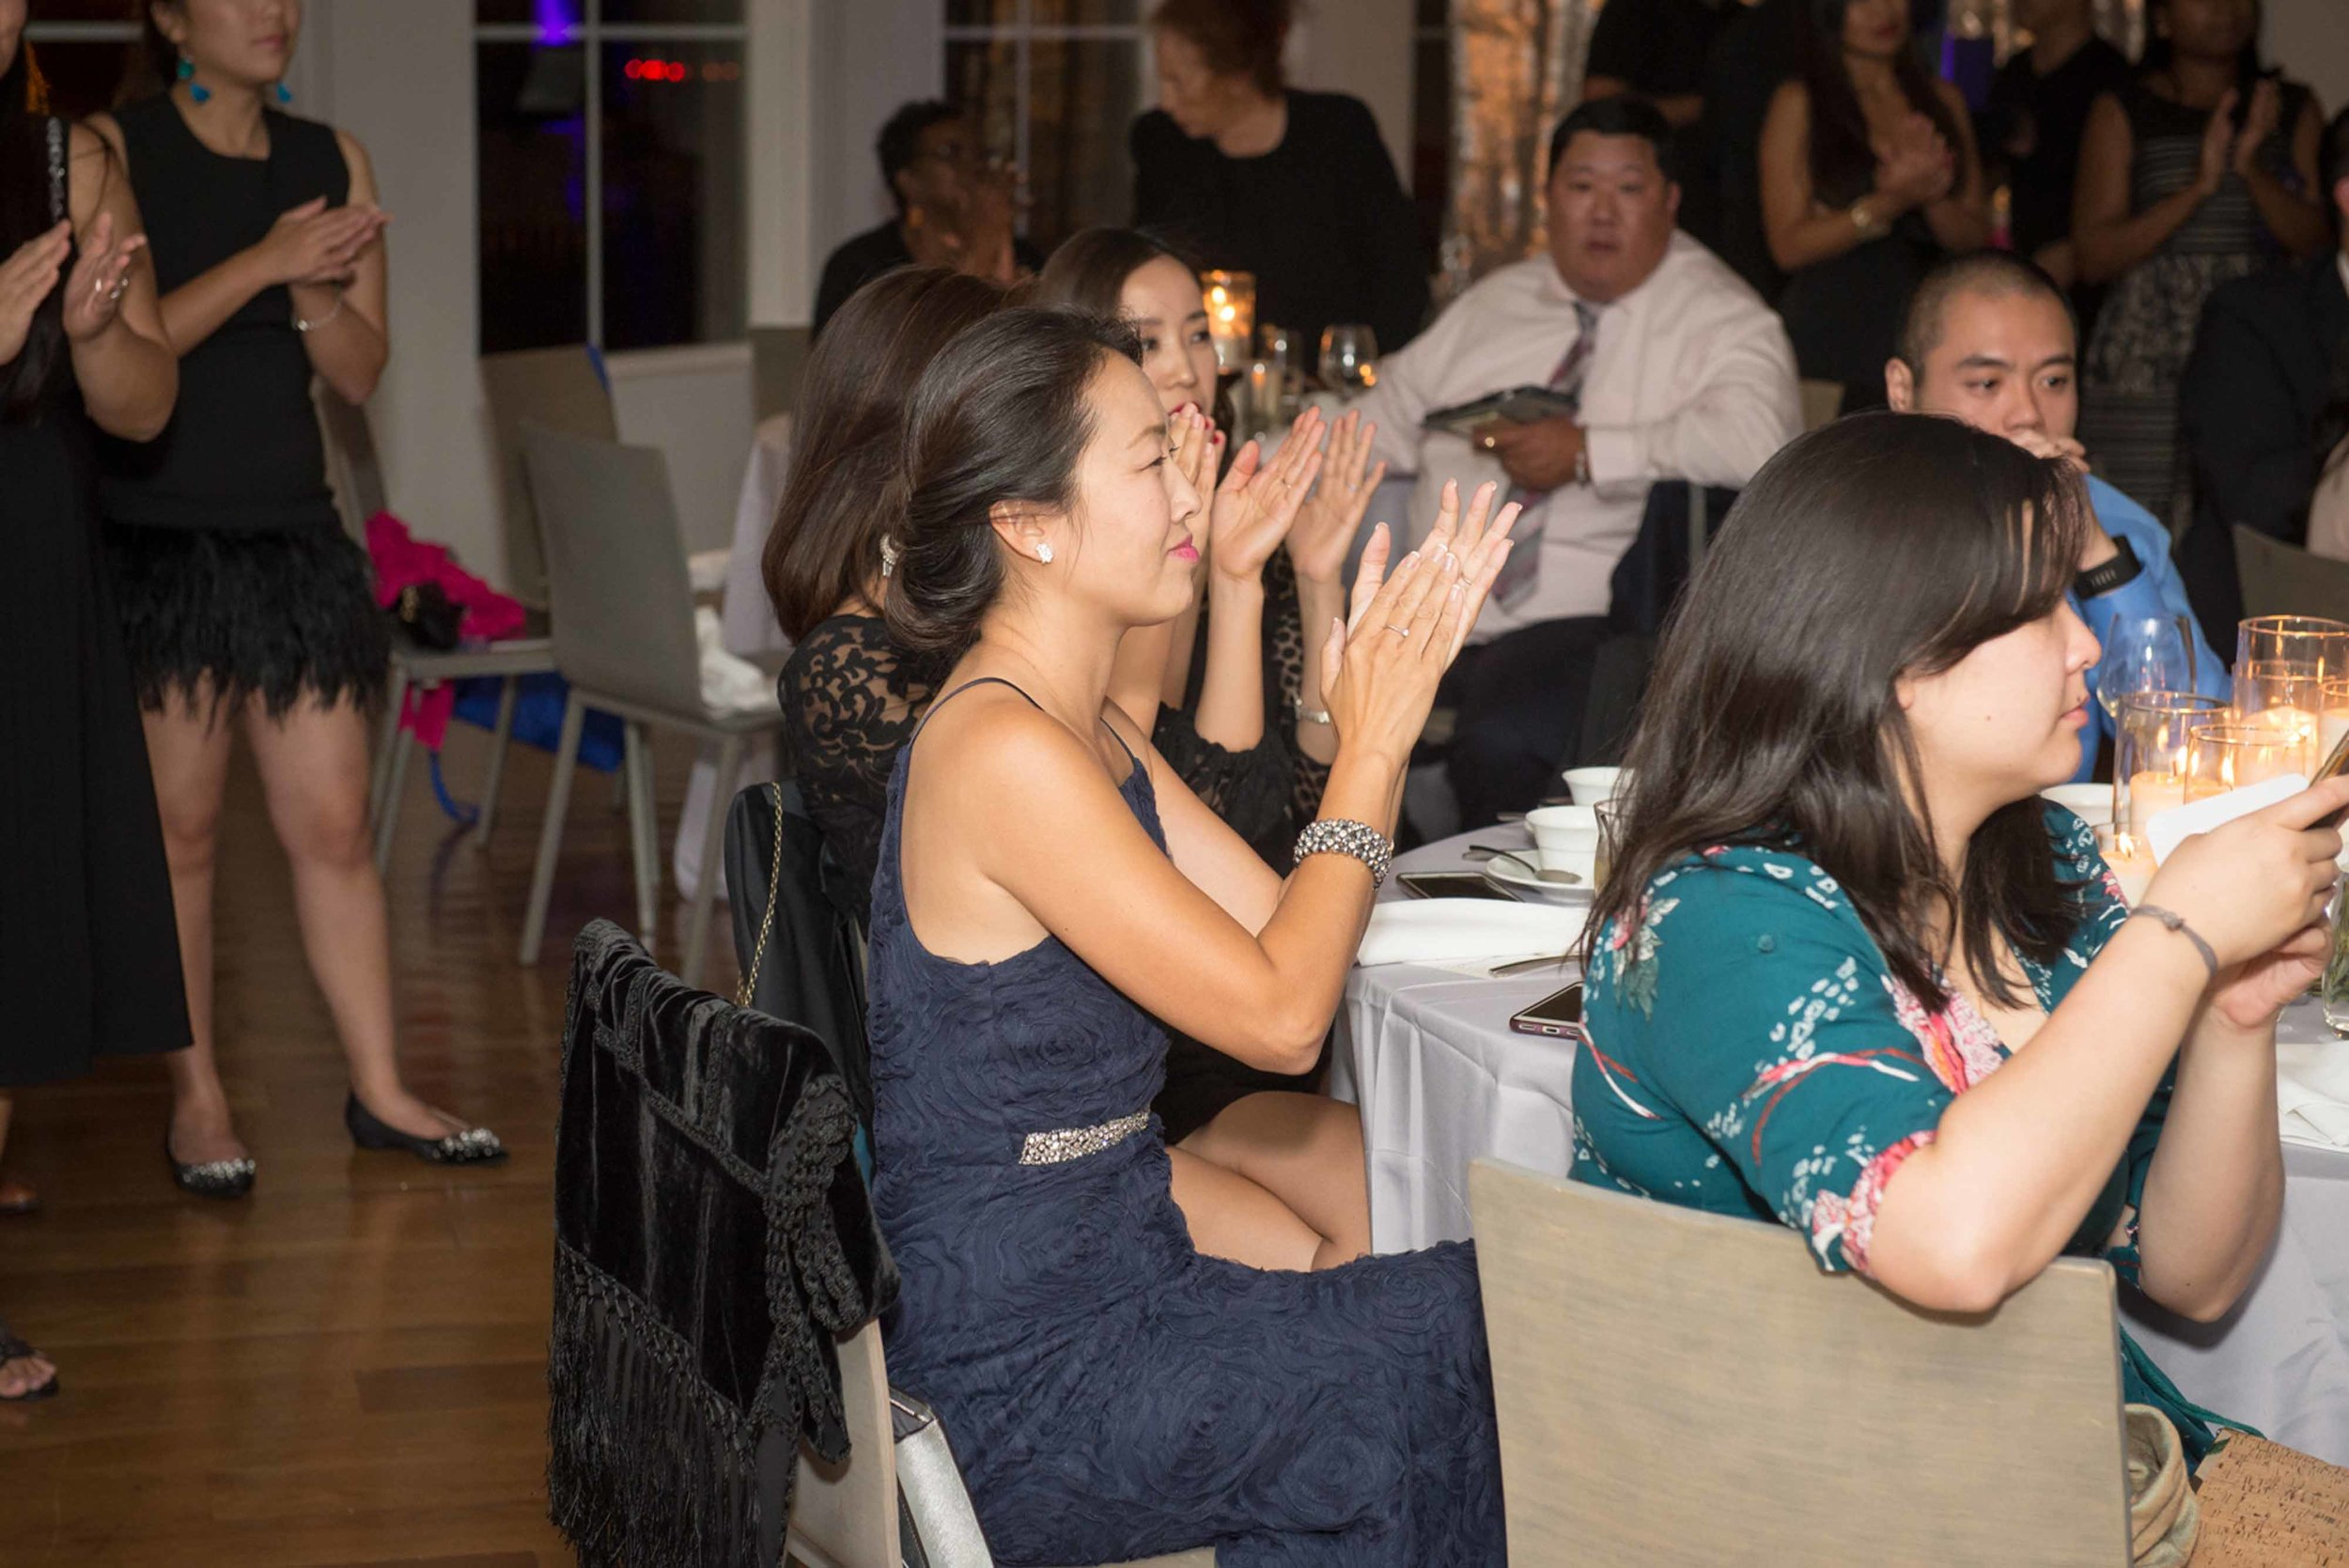 2017-10-21 Zimele USA 6th Annual Gala - Maritime Parc - Jersey City NJ_0274.jpg